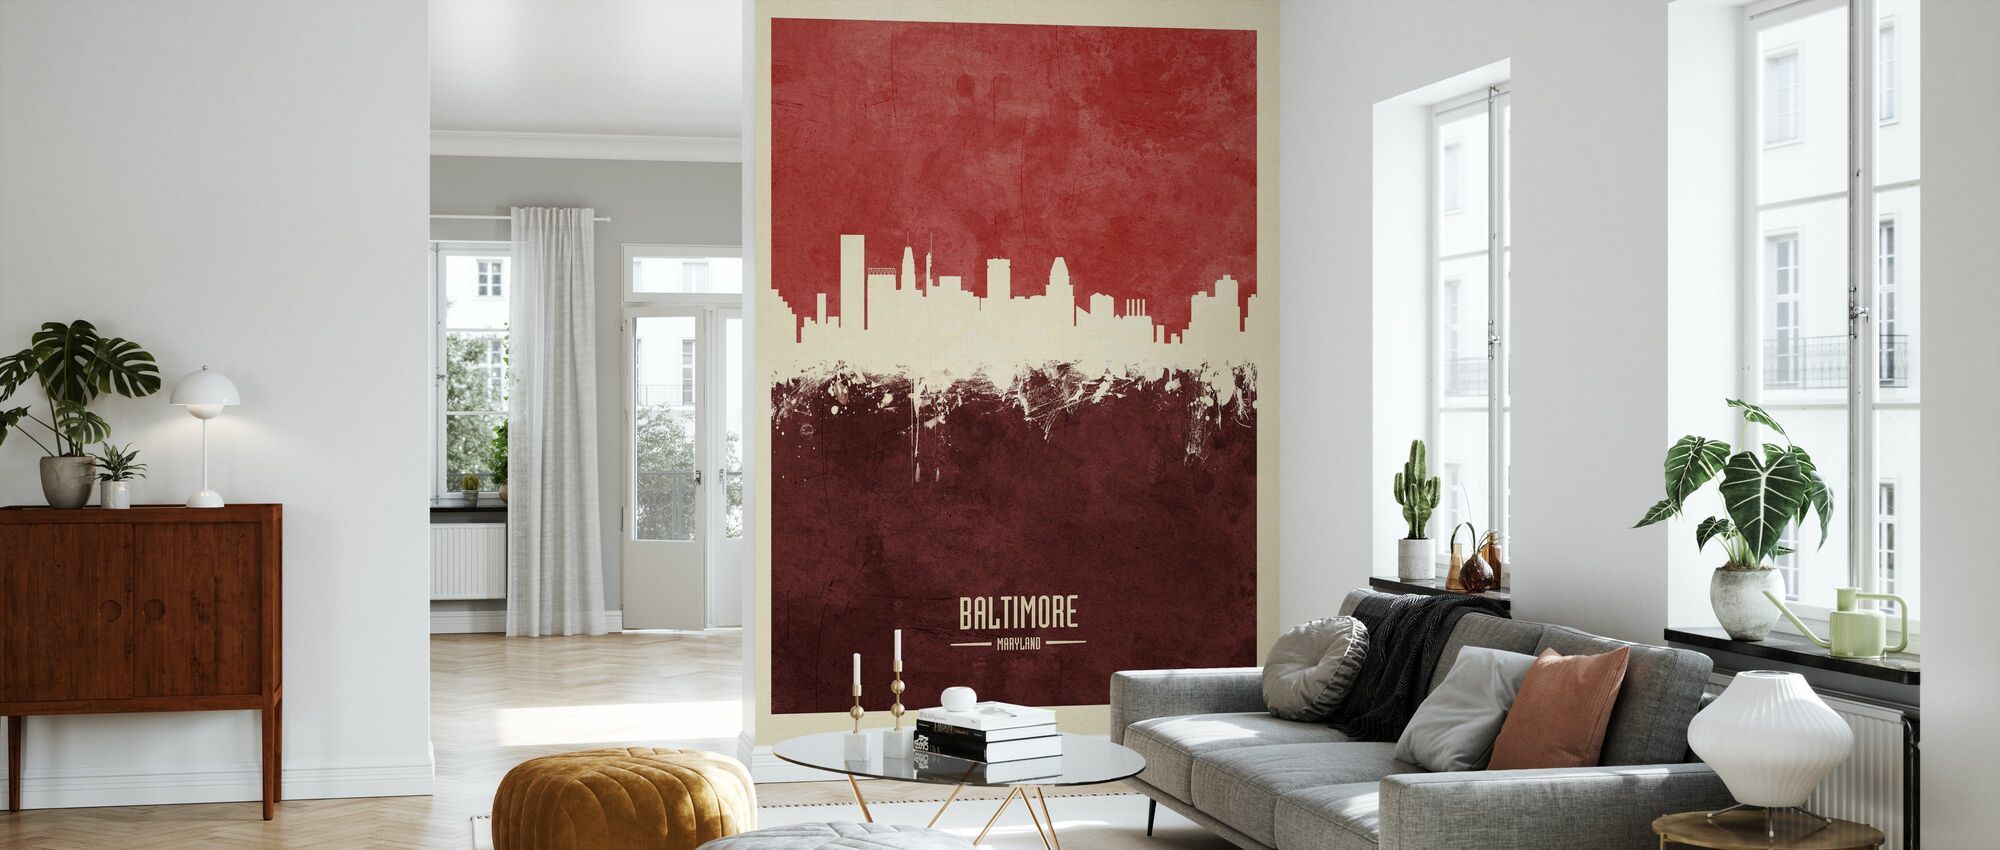 Baltimore Maryland Skyline Red - Wallpaper - Living Room